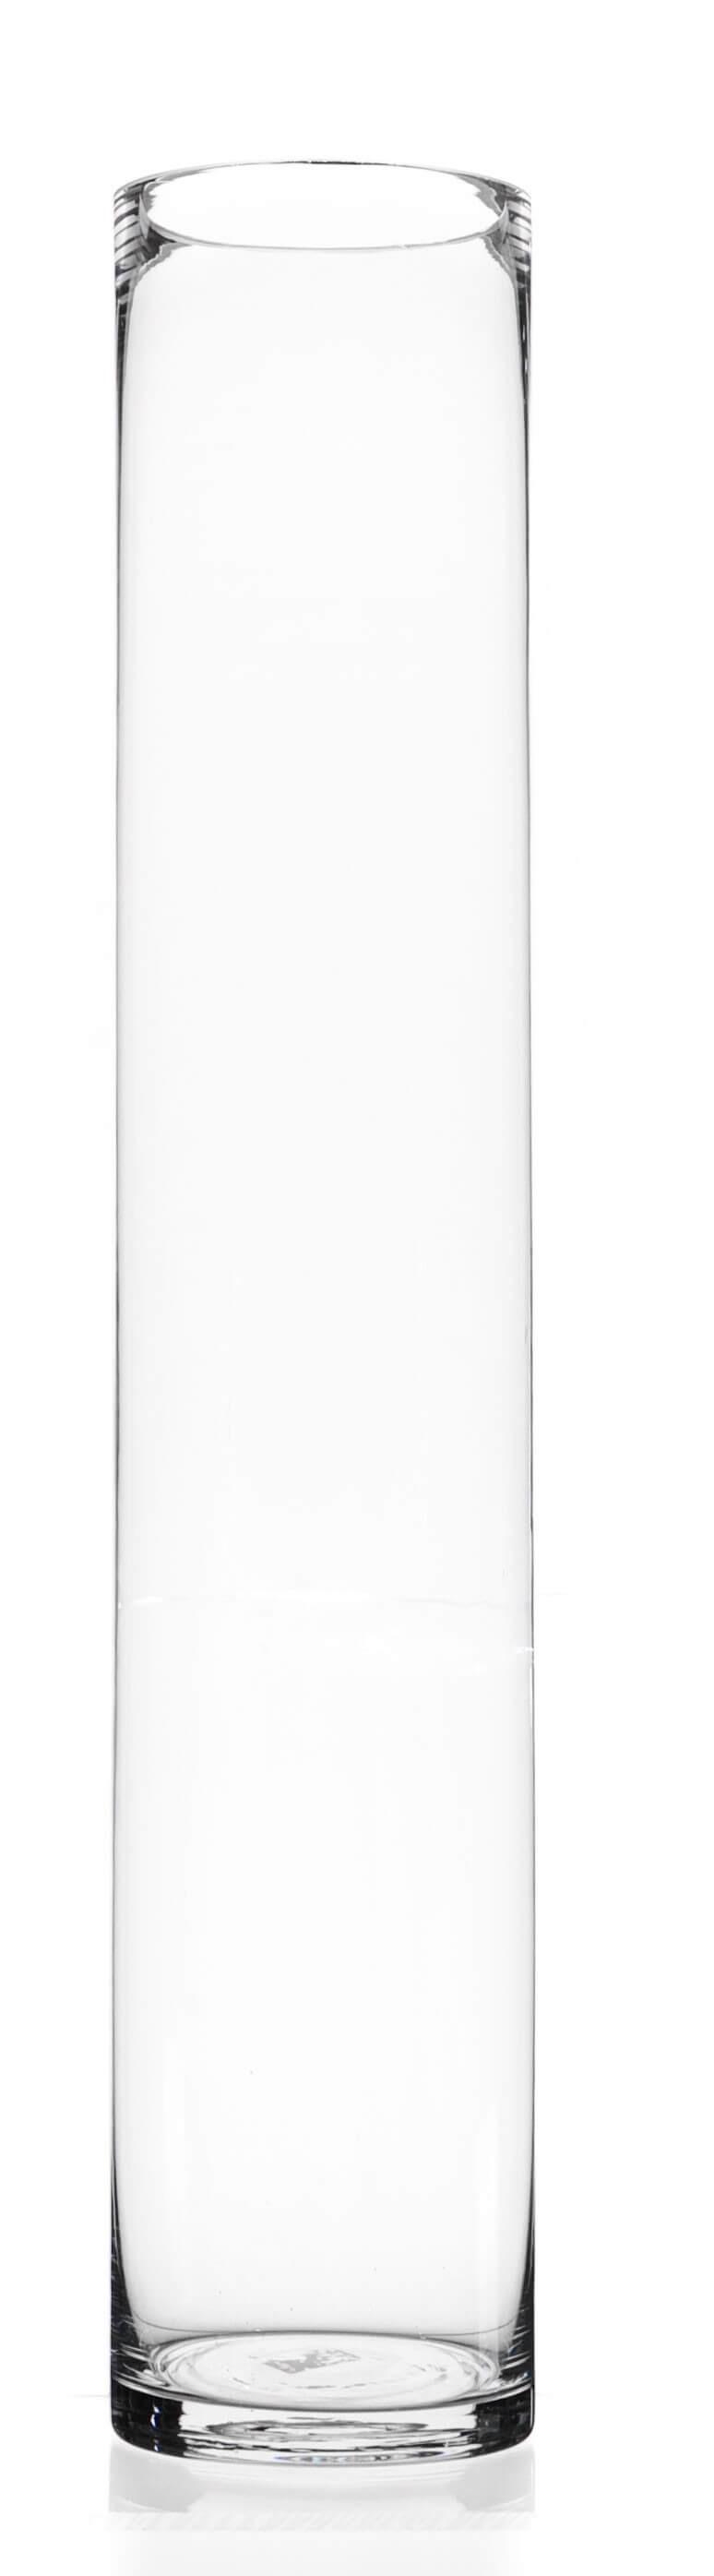 Cylinder 30X10cm